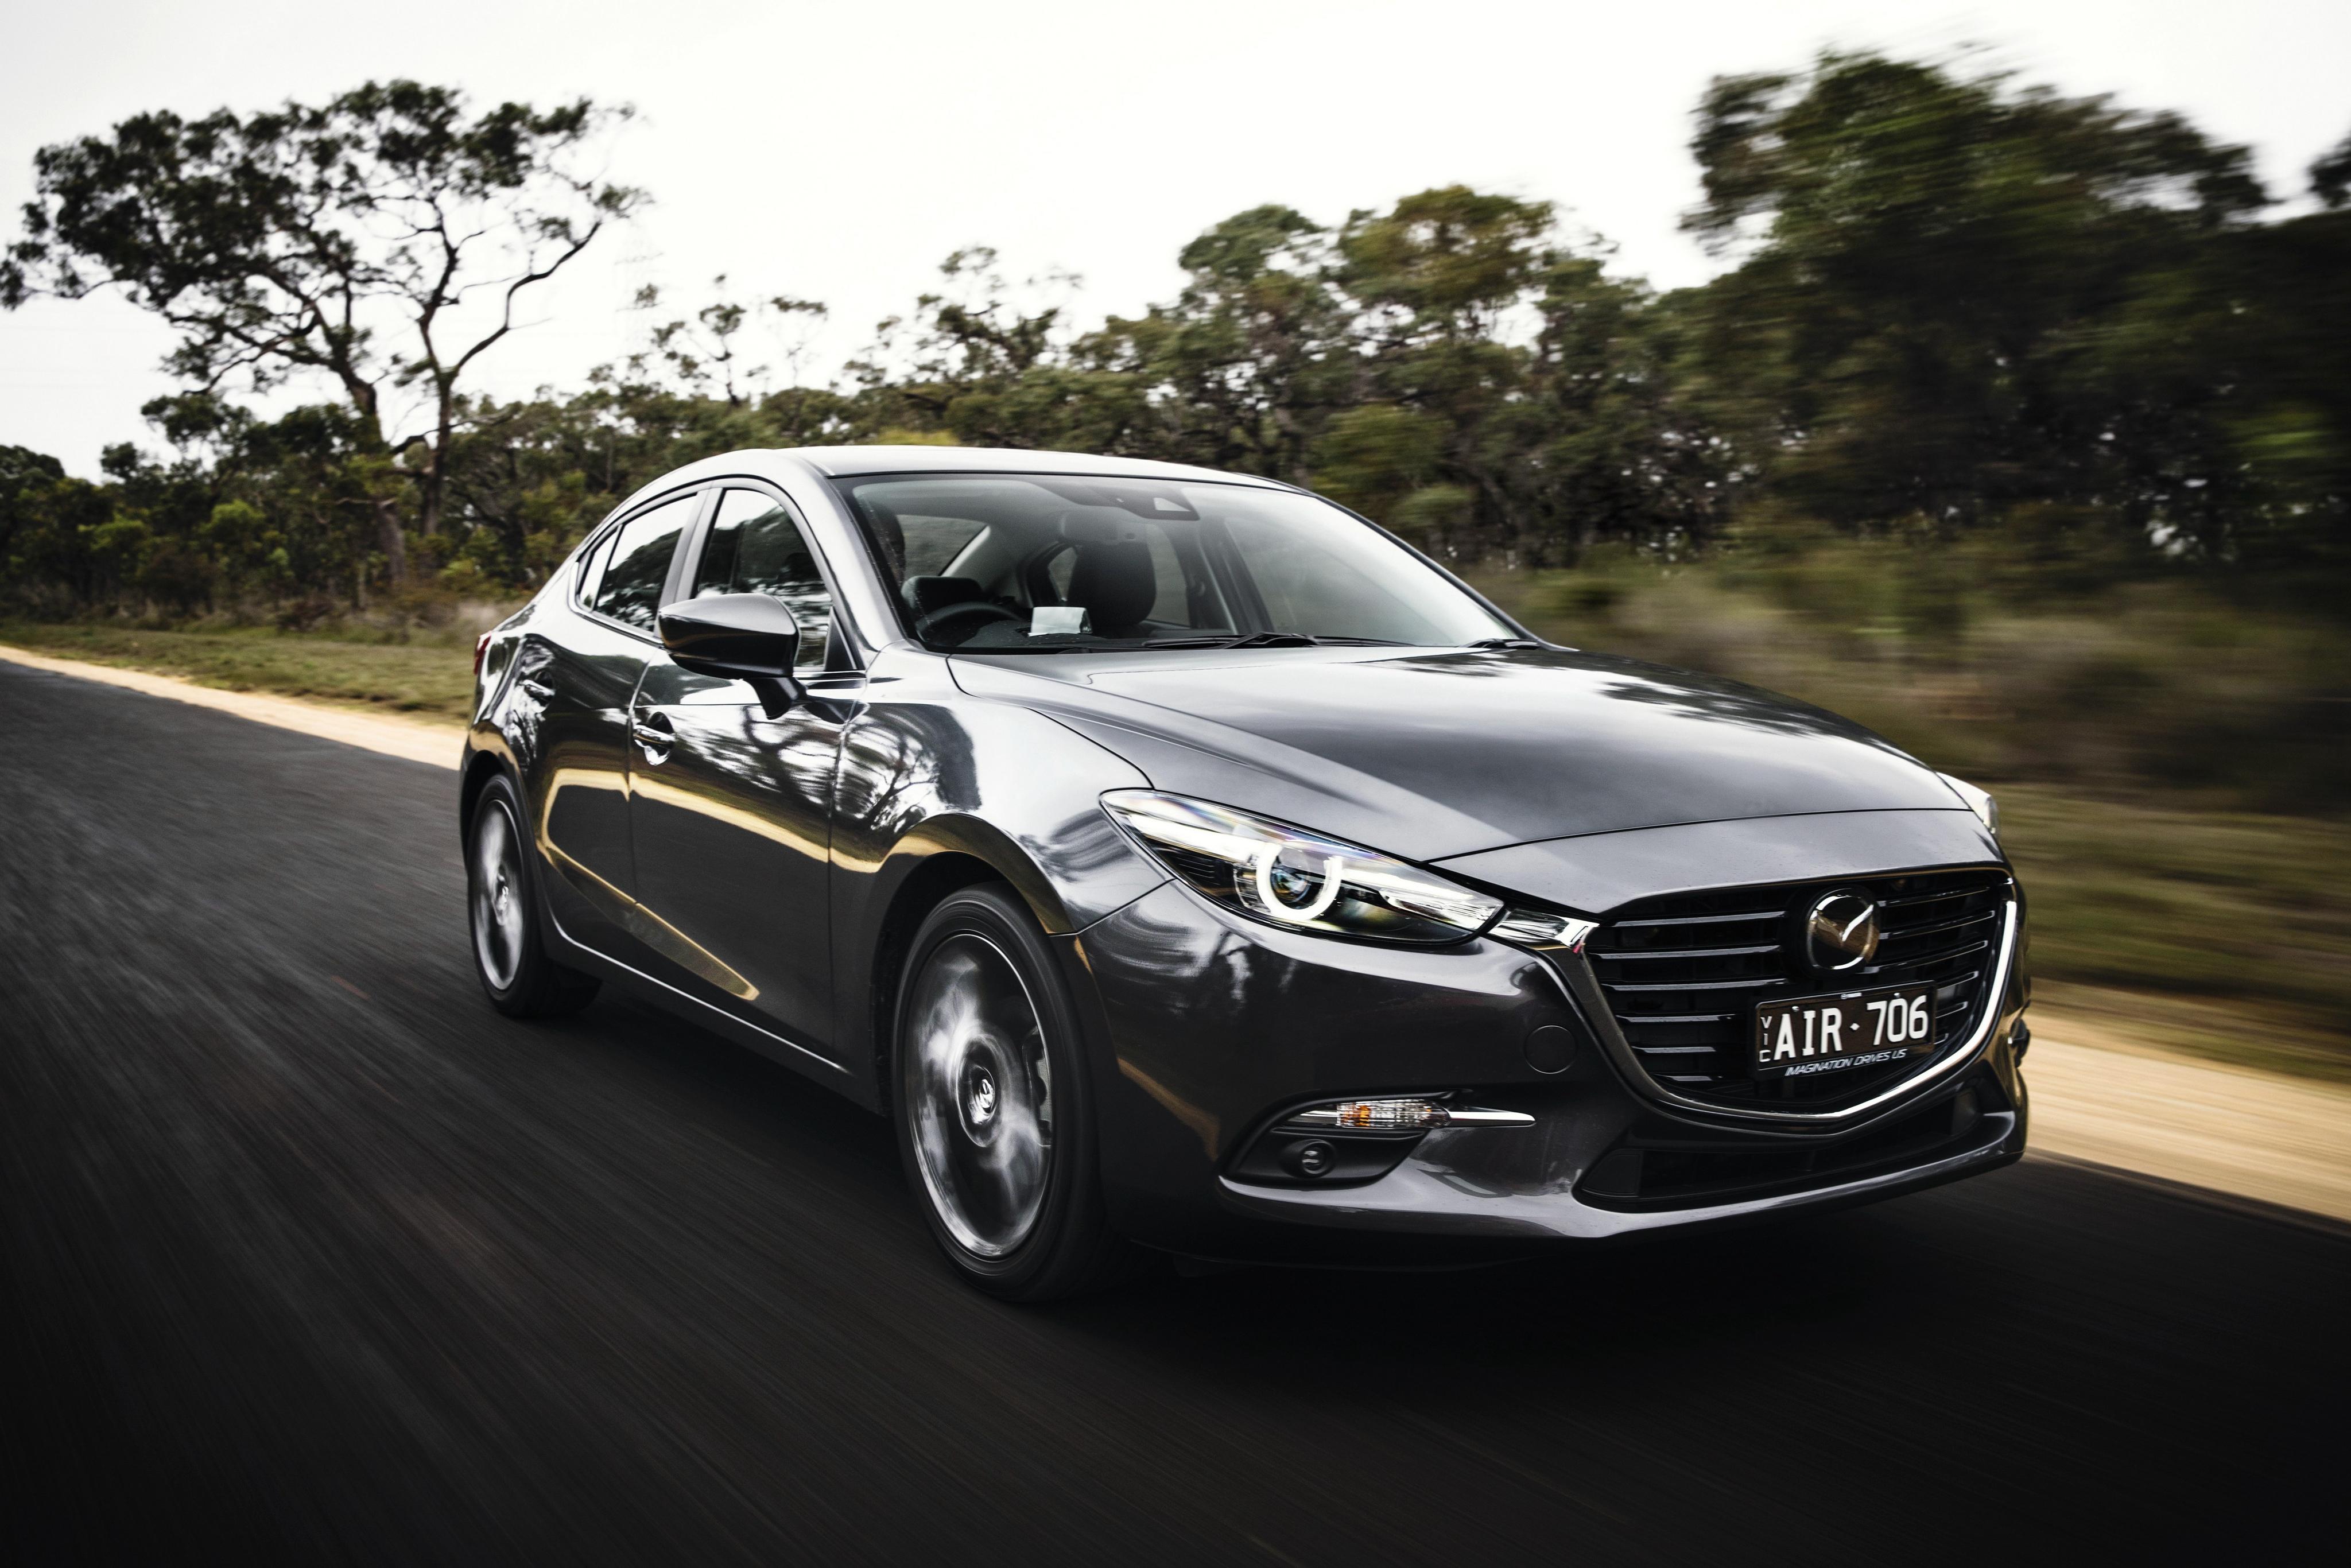 Mazda 3 Hatch >> GALLERY: Mazda 3 facelift – Australian sedan, hatch Image 528883